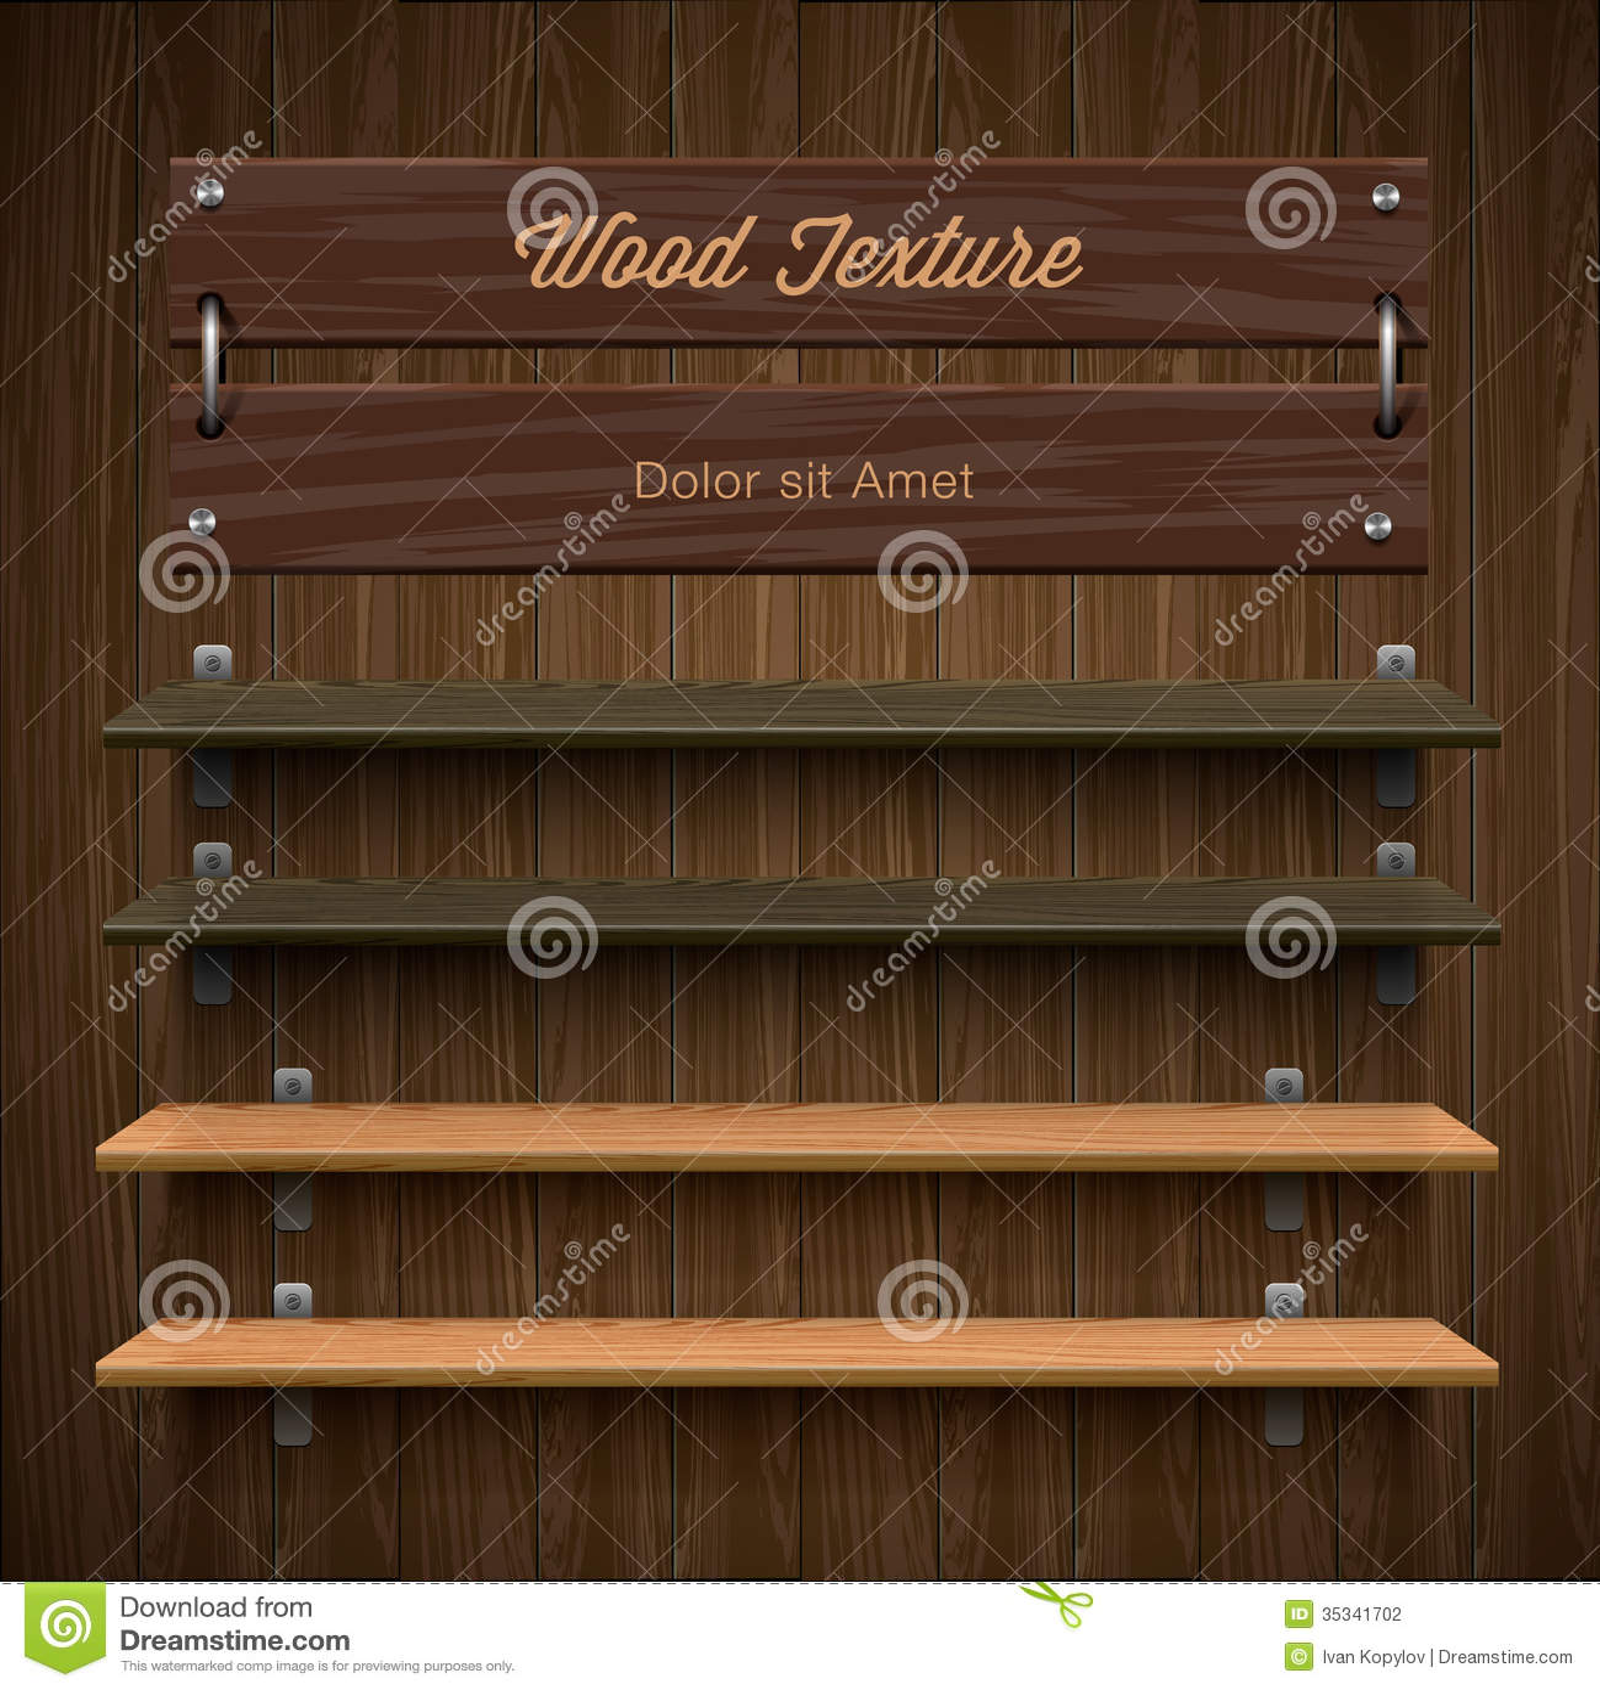 Blank Wooden Bookshelf Stock Photography - Image: 35341702